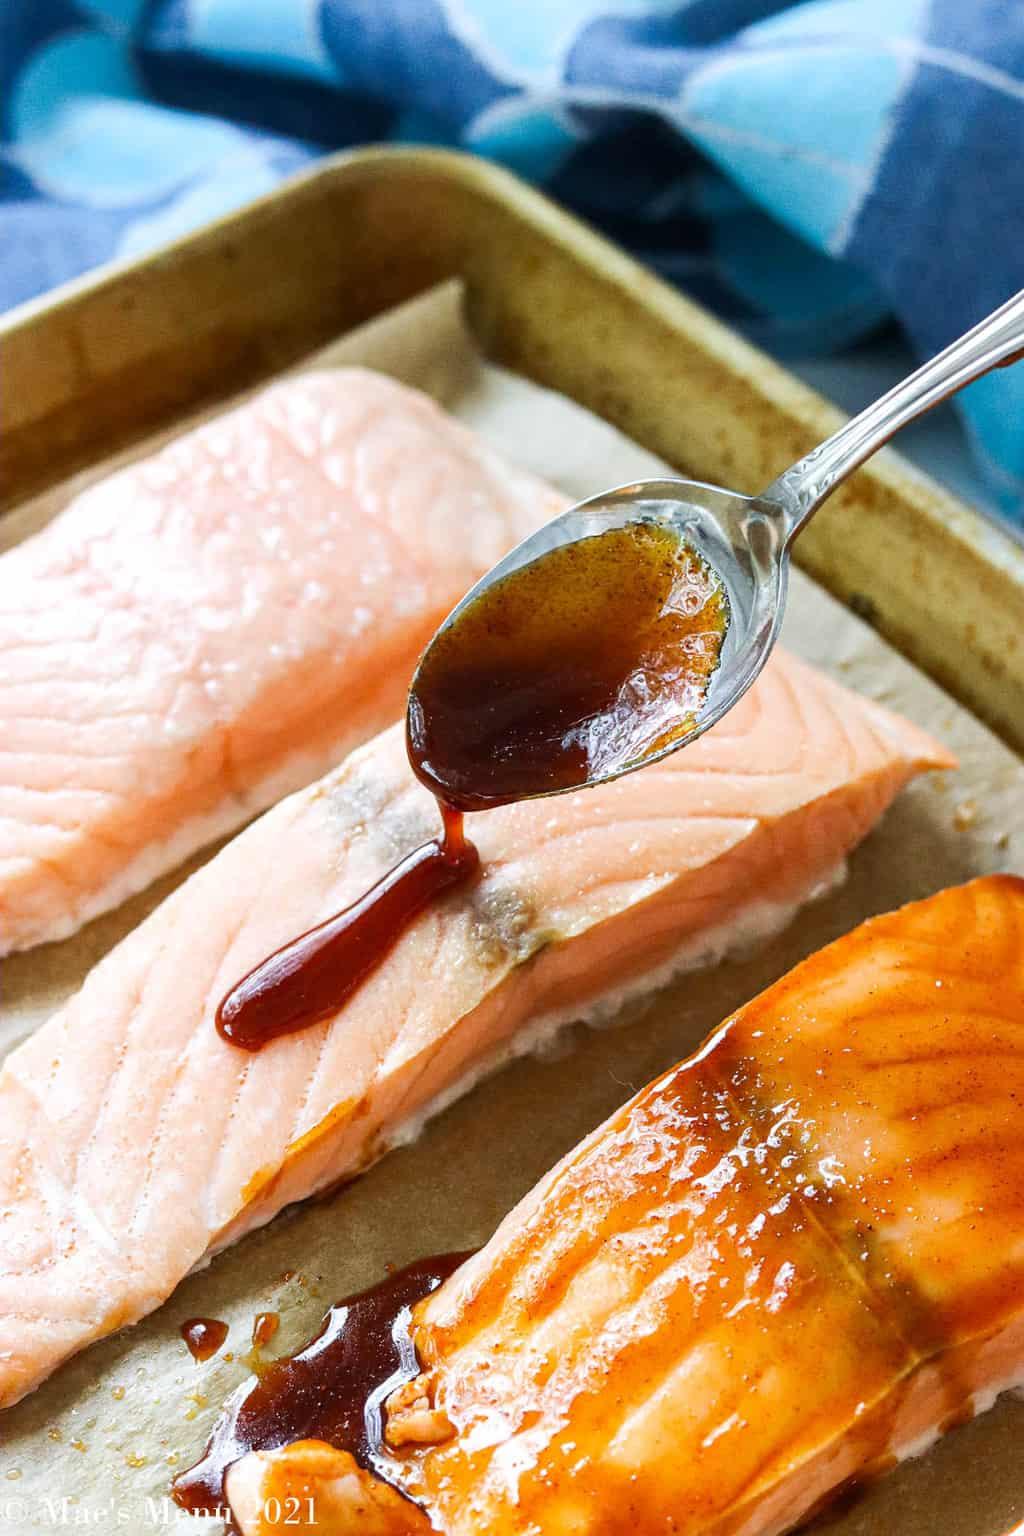 Drizzling brown sugar bourbon glaze over the salmon